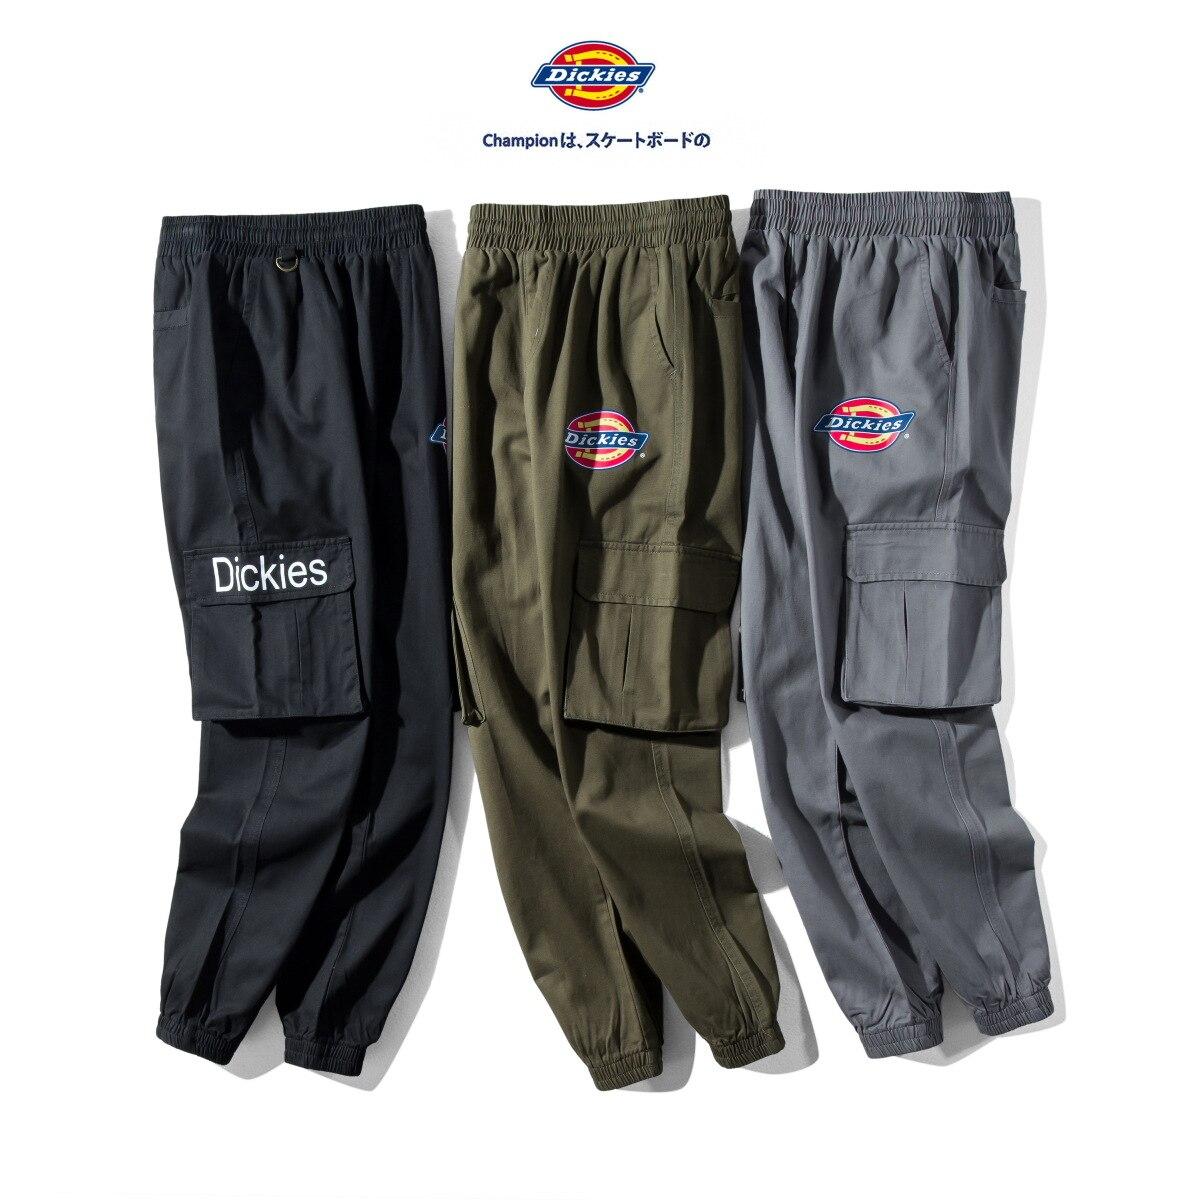 2019 Popular Brand Dickies Di Ke MEN'S Casual Trousers Loose-Fit Trend Versatile Couples Multi-pockets Workwear Cloth